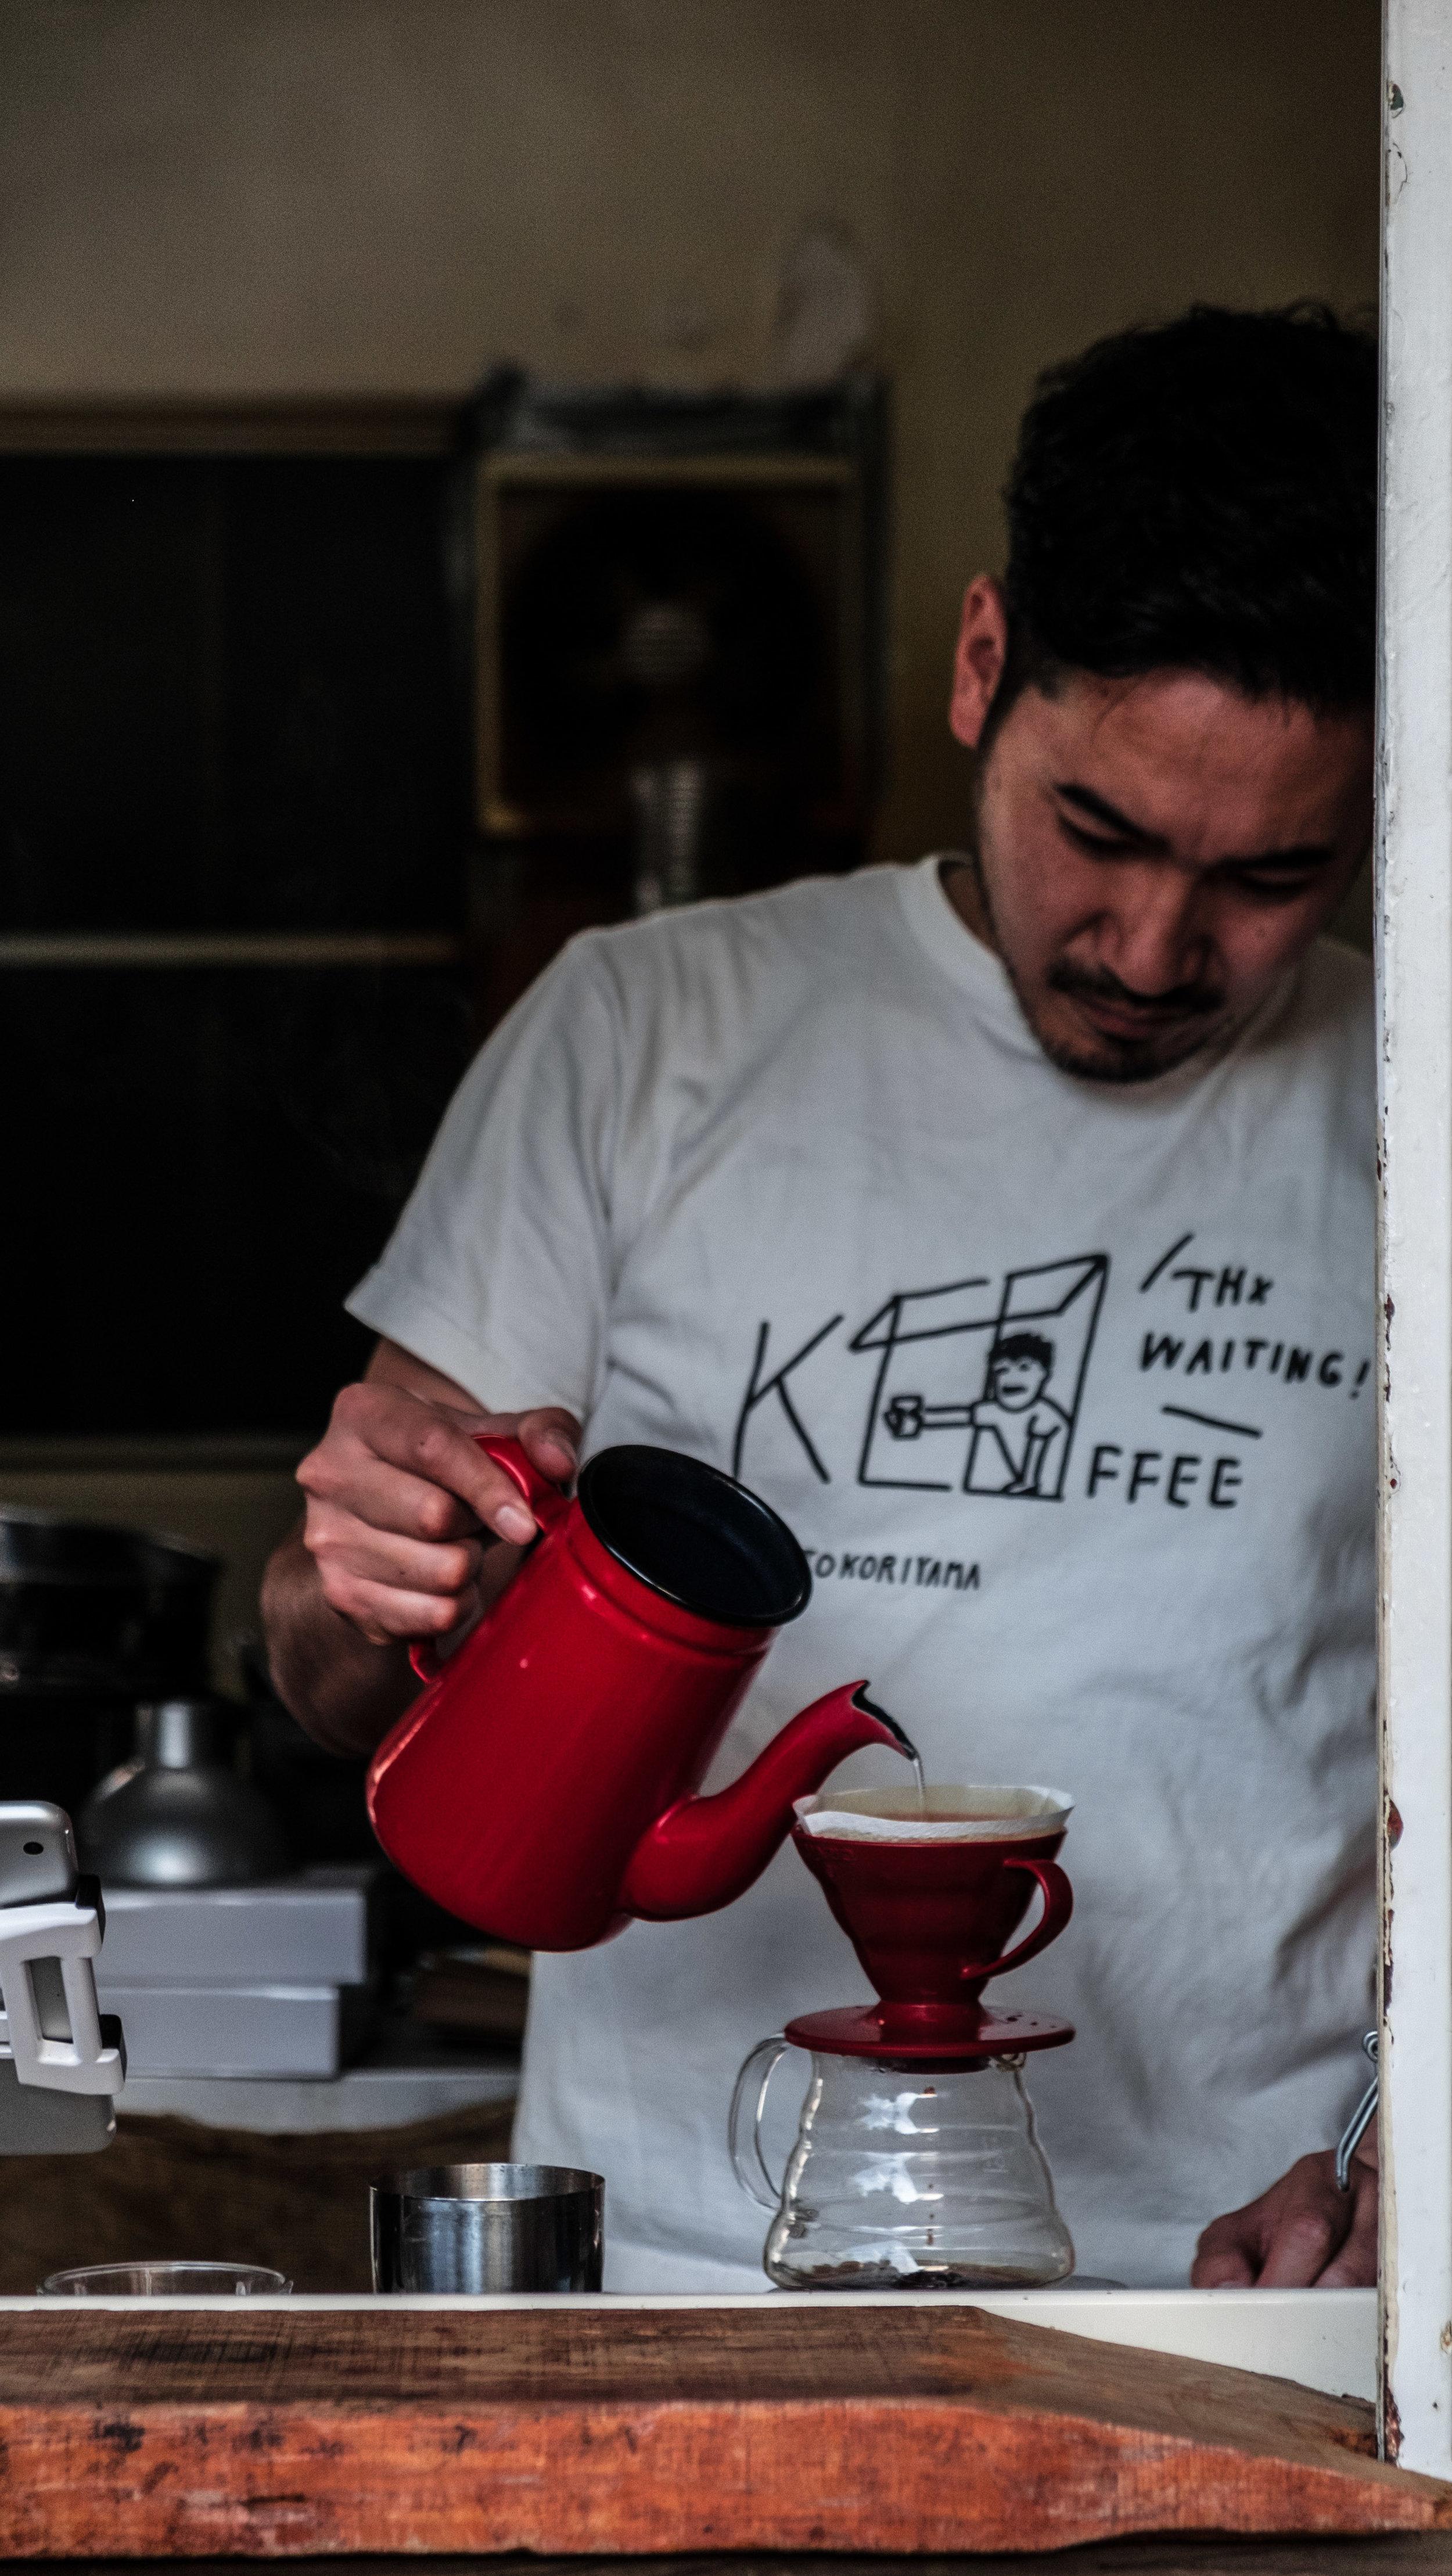 naracoffee2.jpg